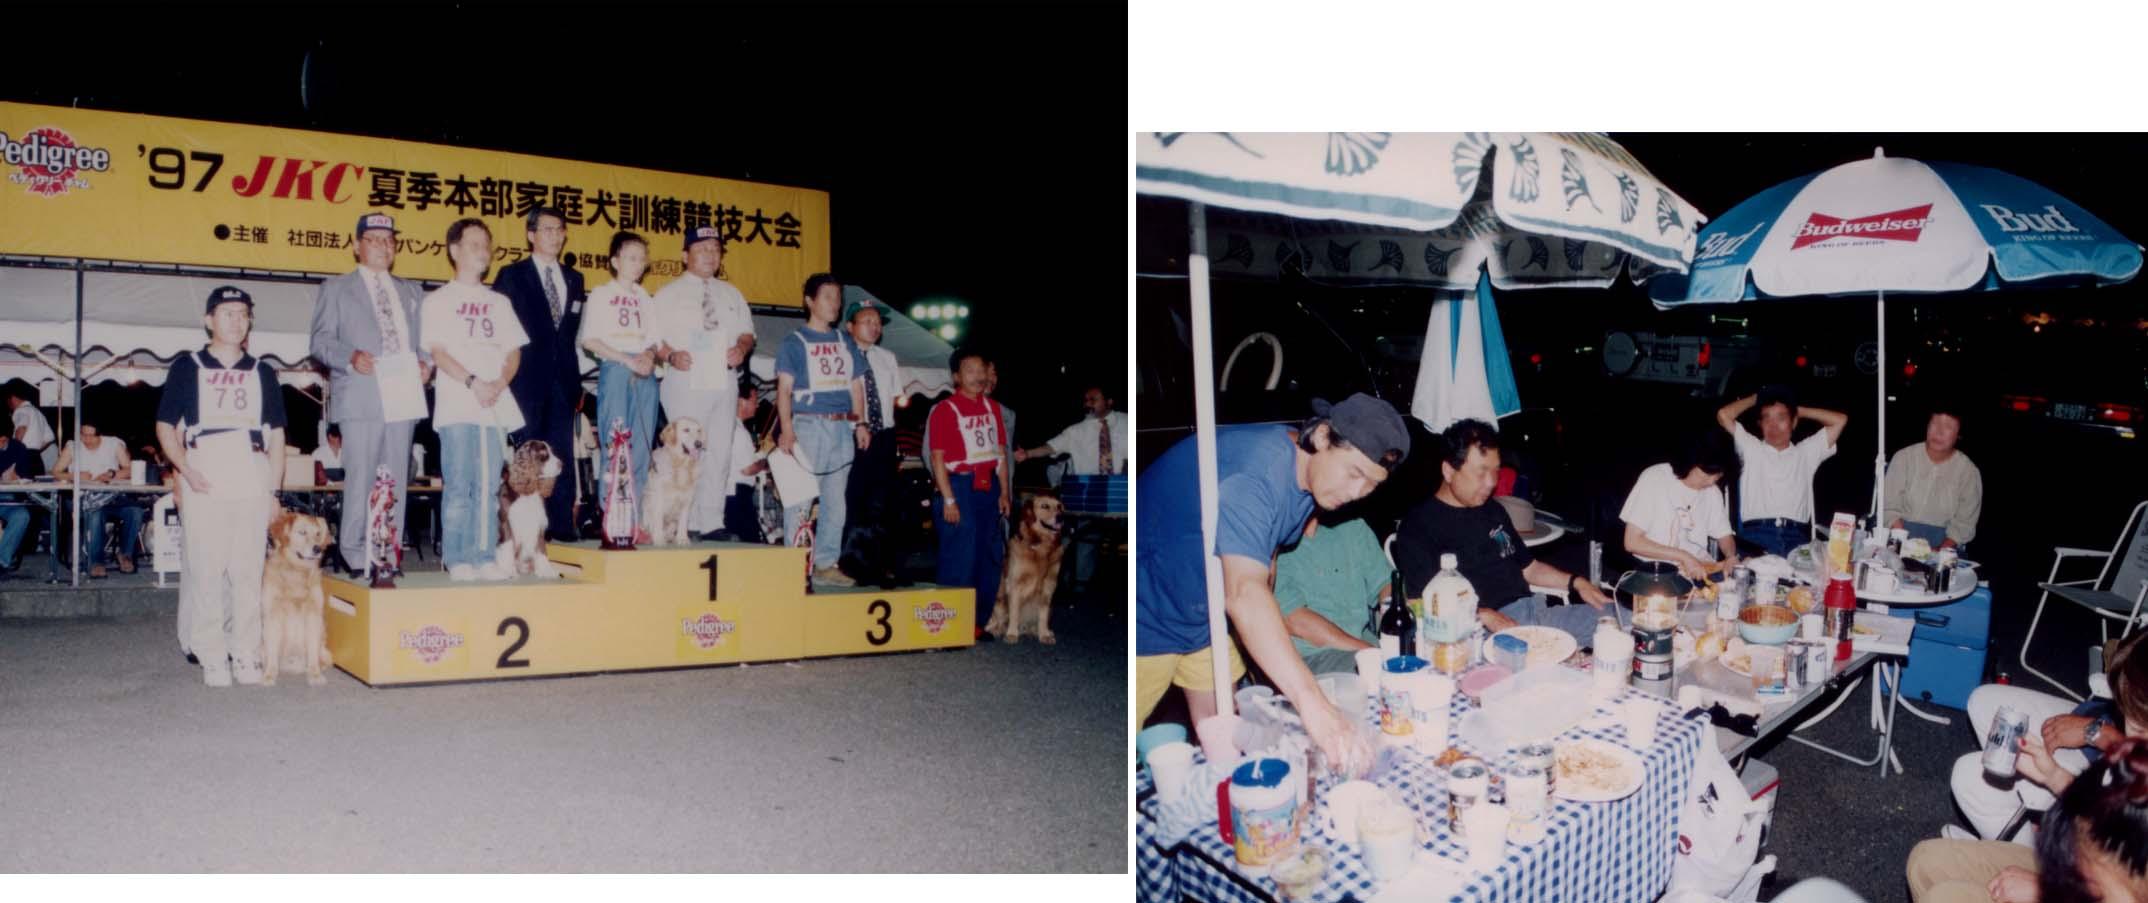 1997年JKC夏季本部競技会の一場面②